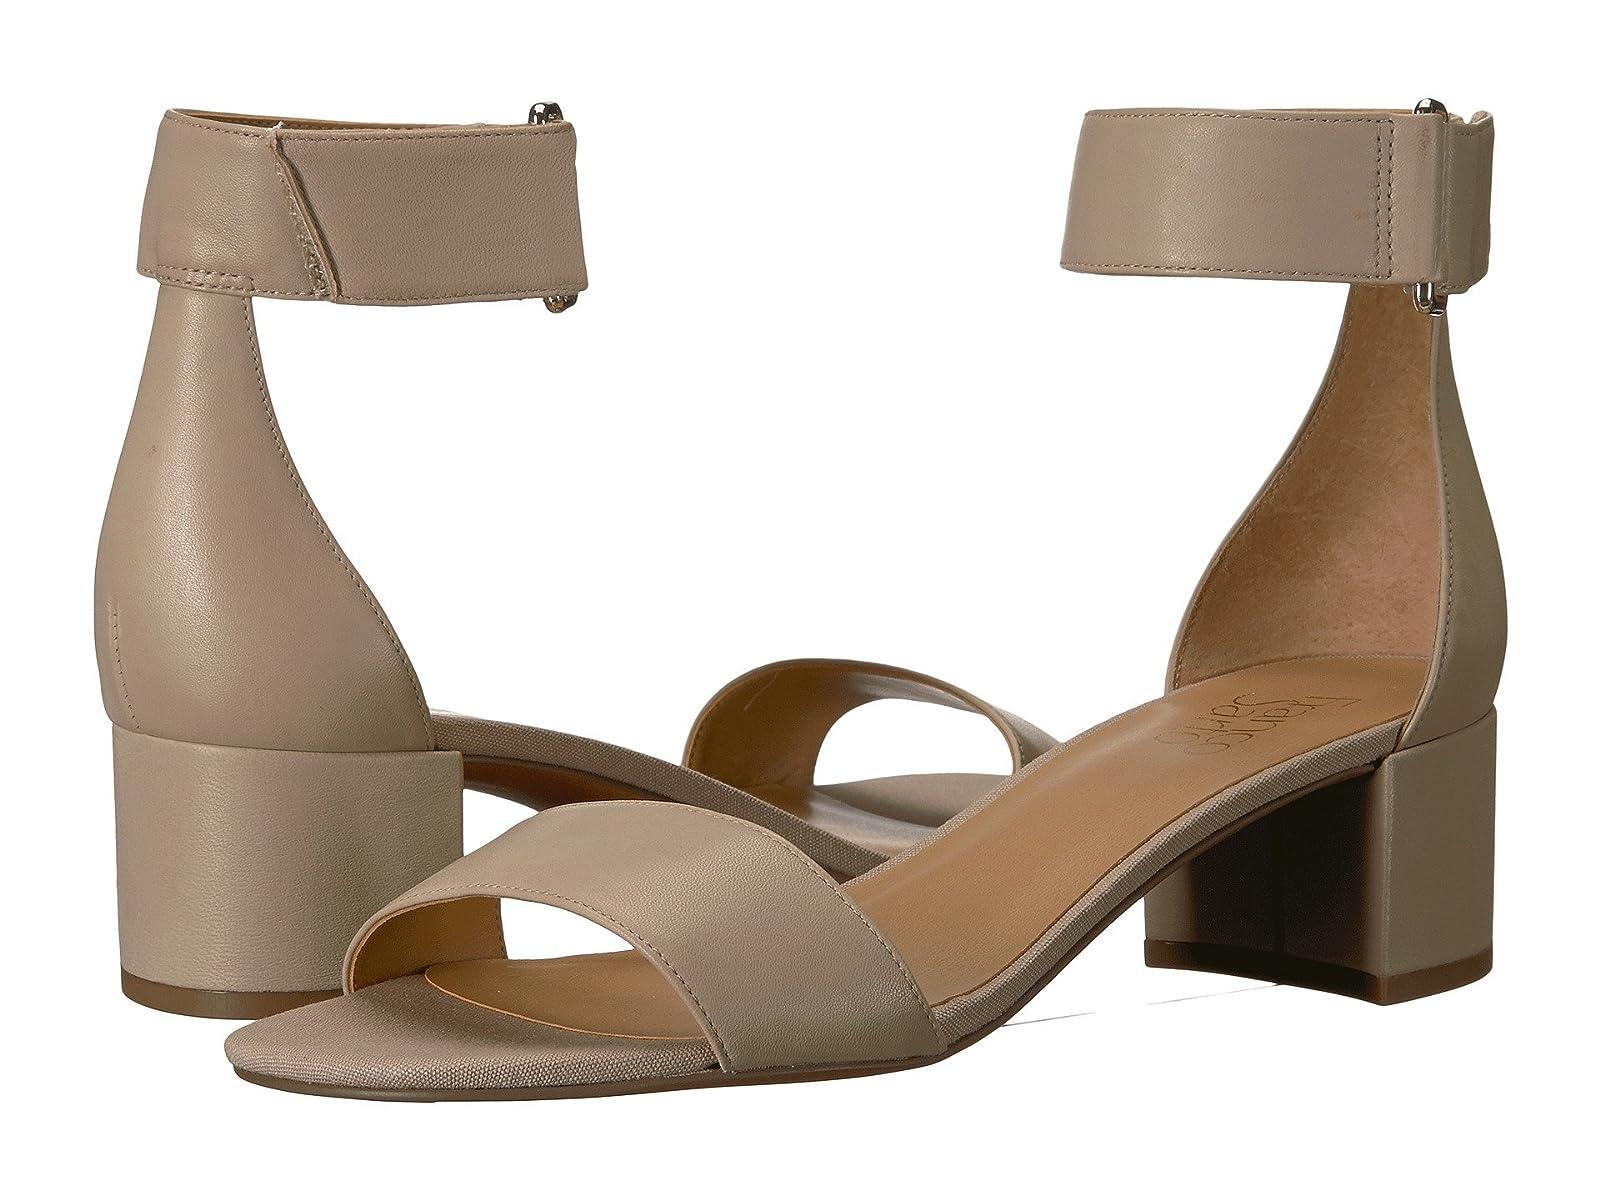 Franco Sarto RosalinaAtmospheric grades have affordable shoes